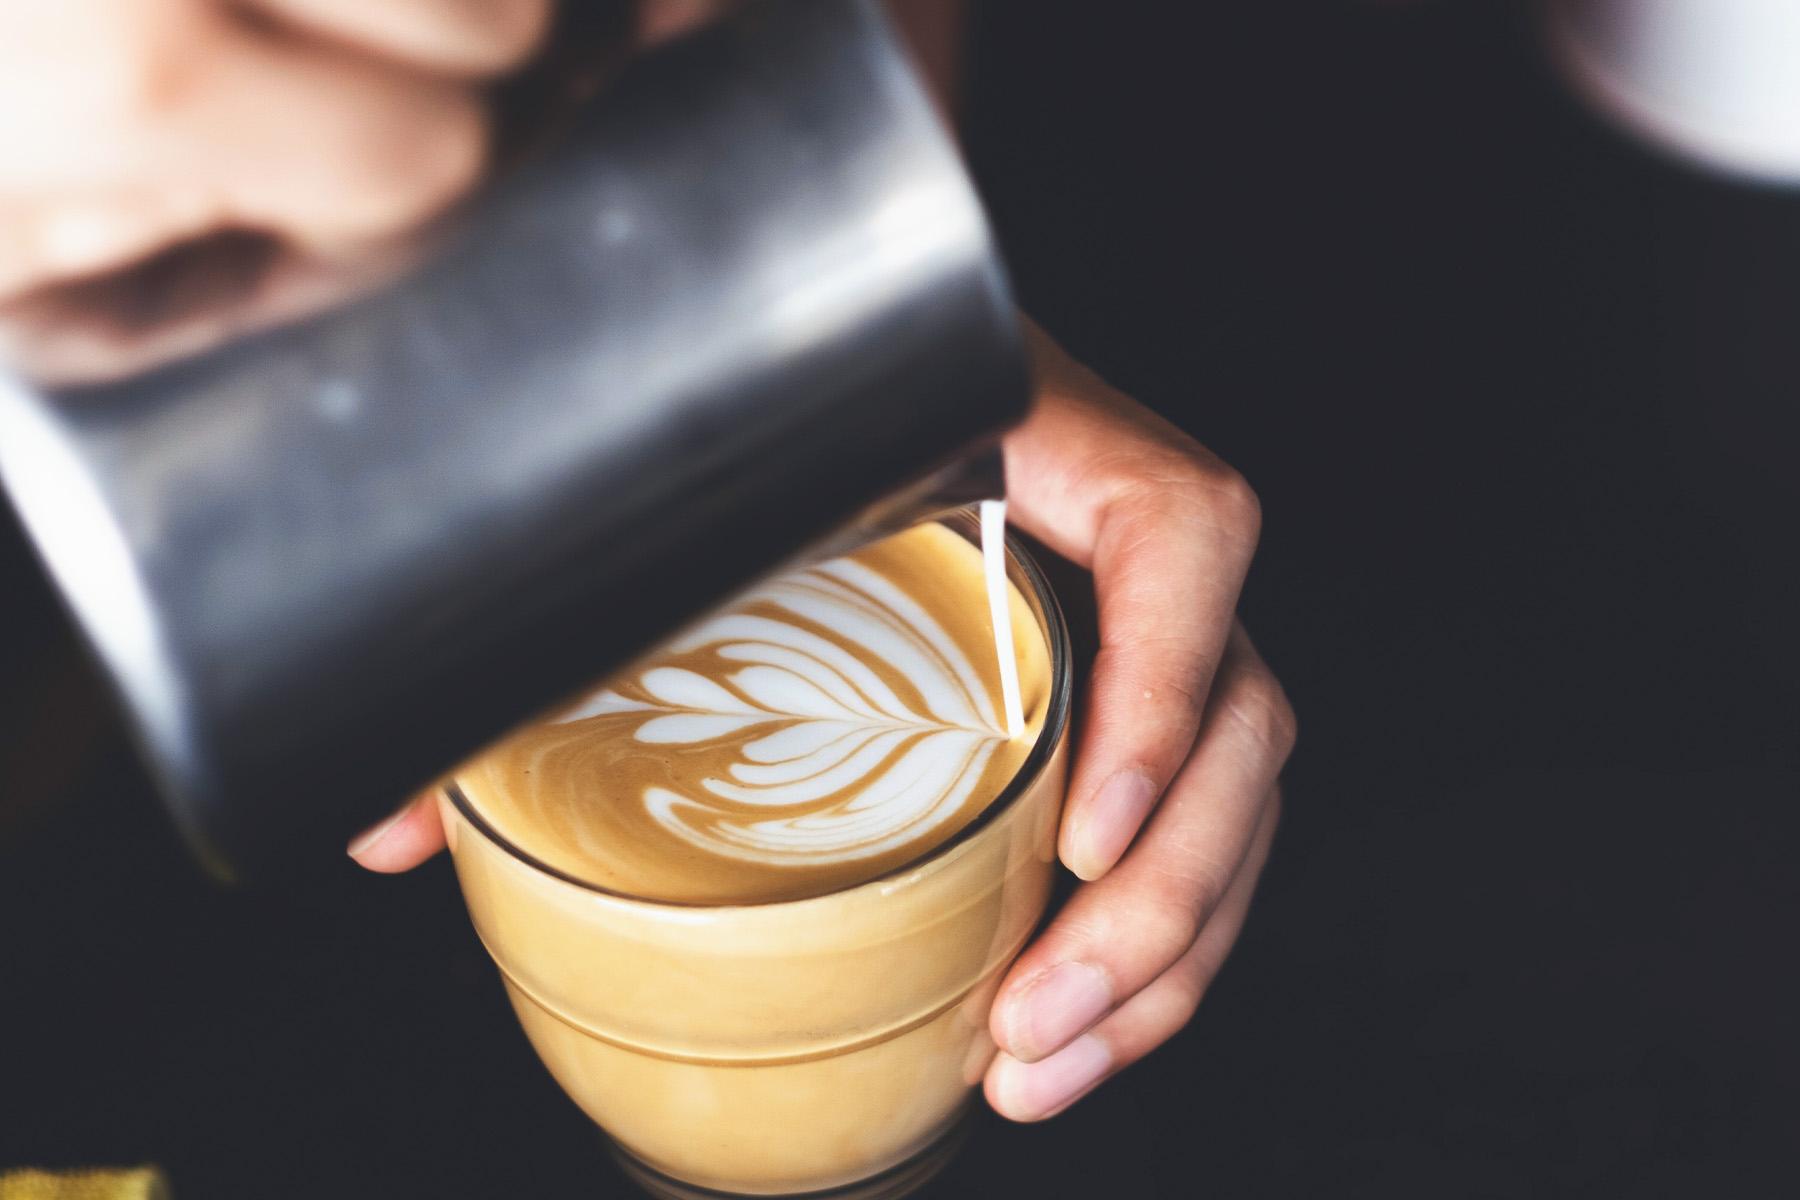 Kaffee, trinken, Köln – ©Unsplash